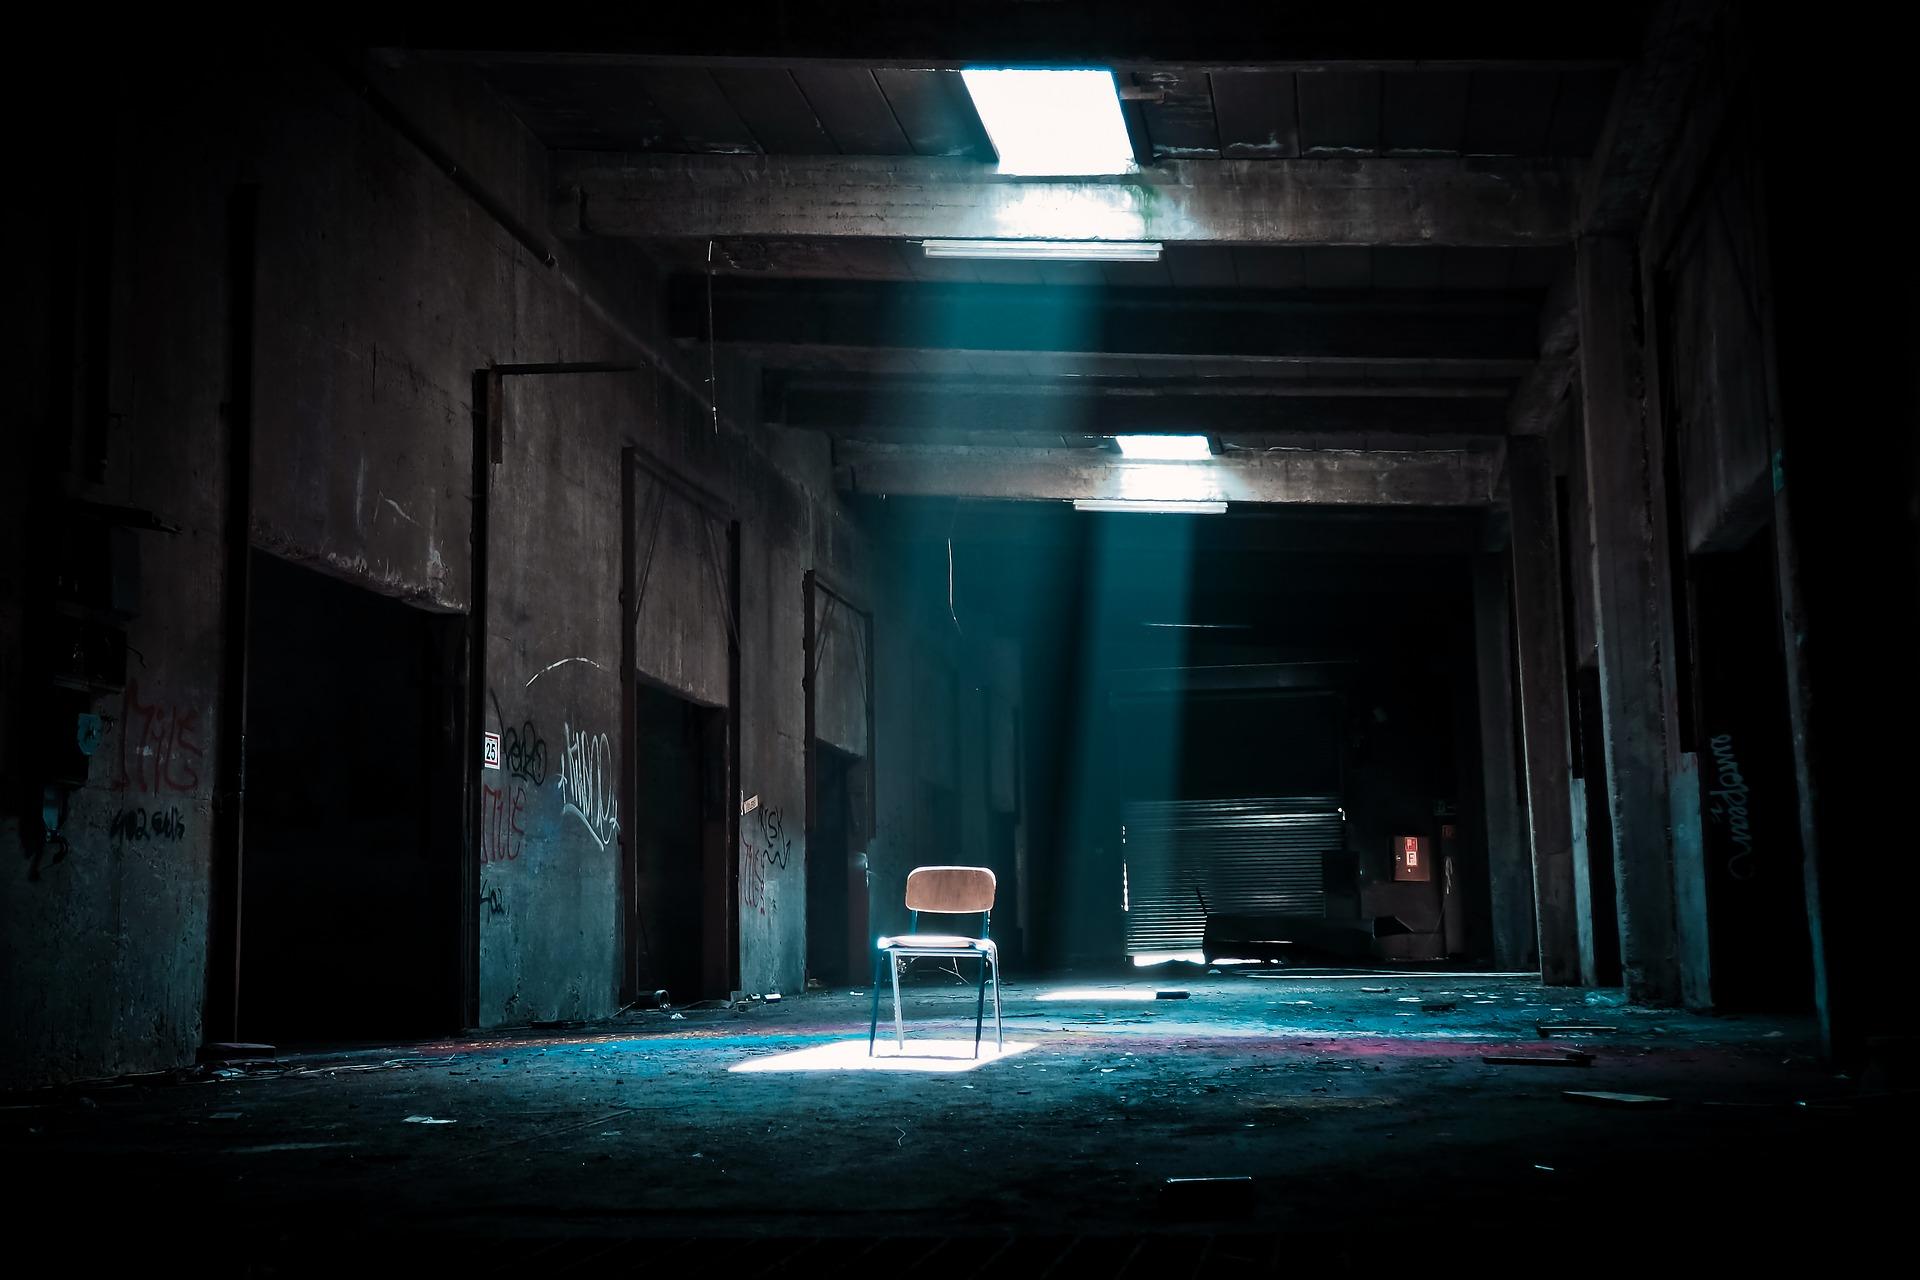 edificio-abandonado